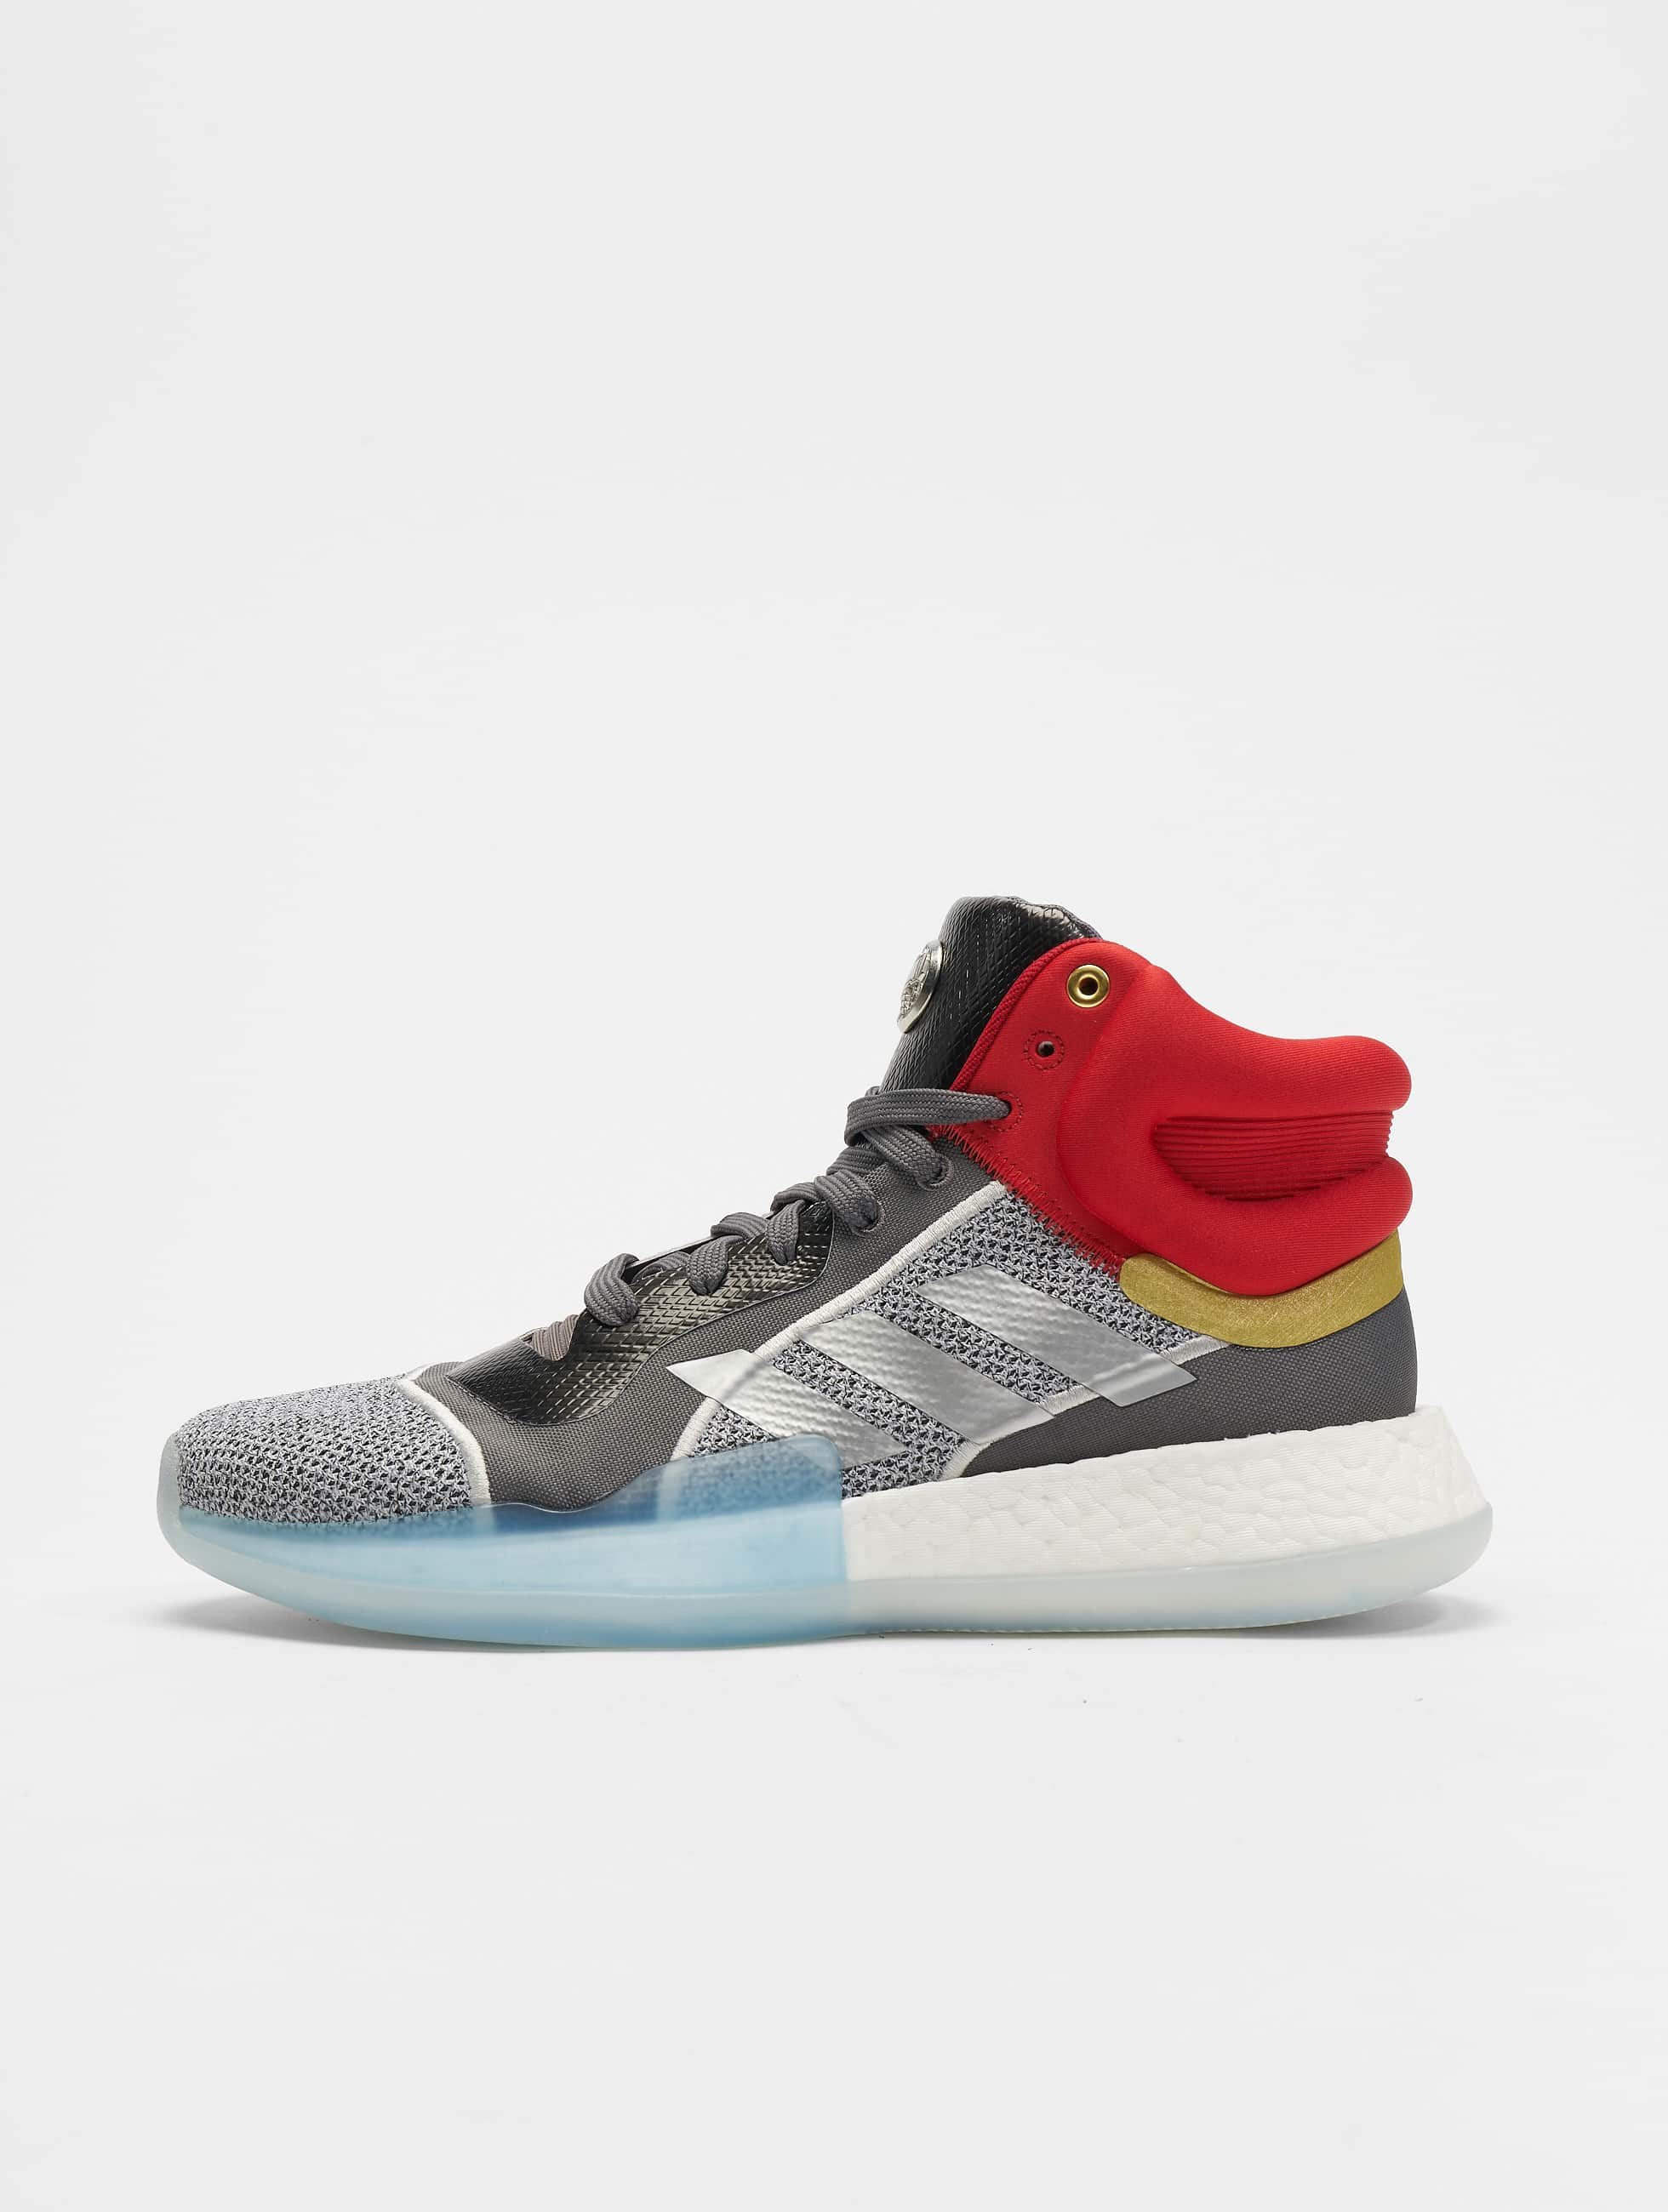 Adidas Marquee Boost Basketball Shoes Ftwr WhiteSilvern MetGrey One